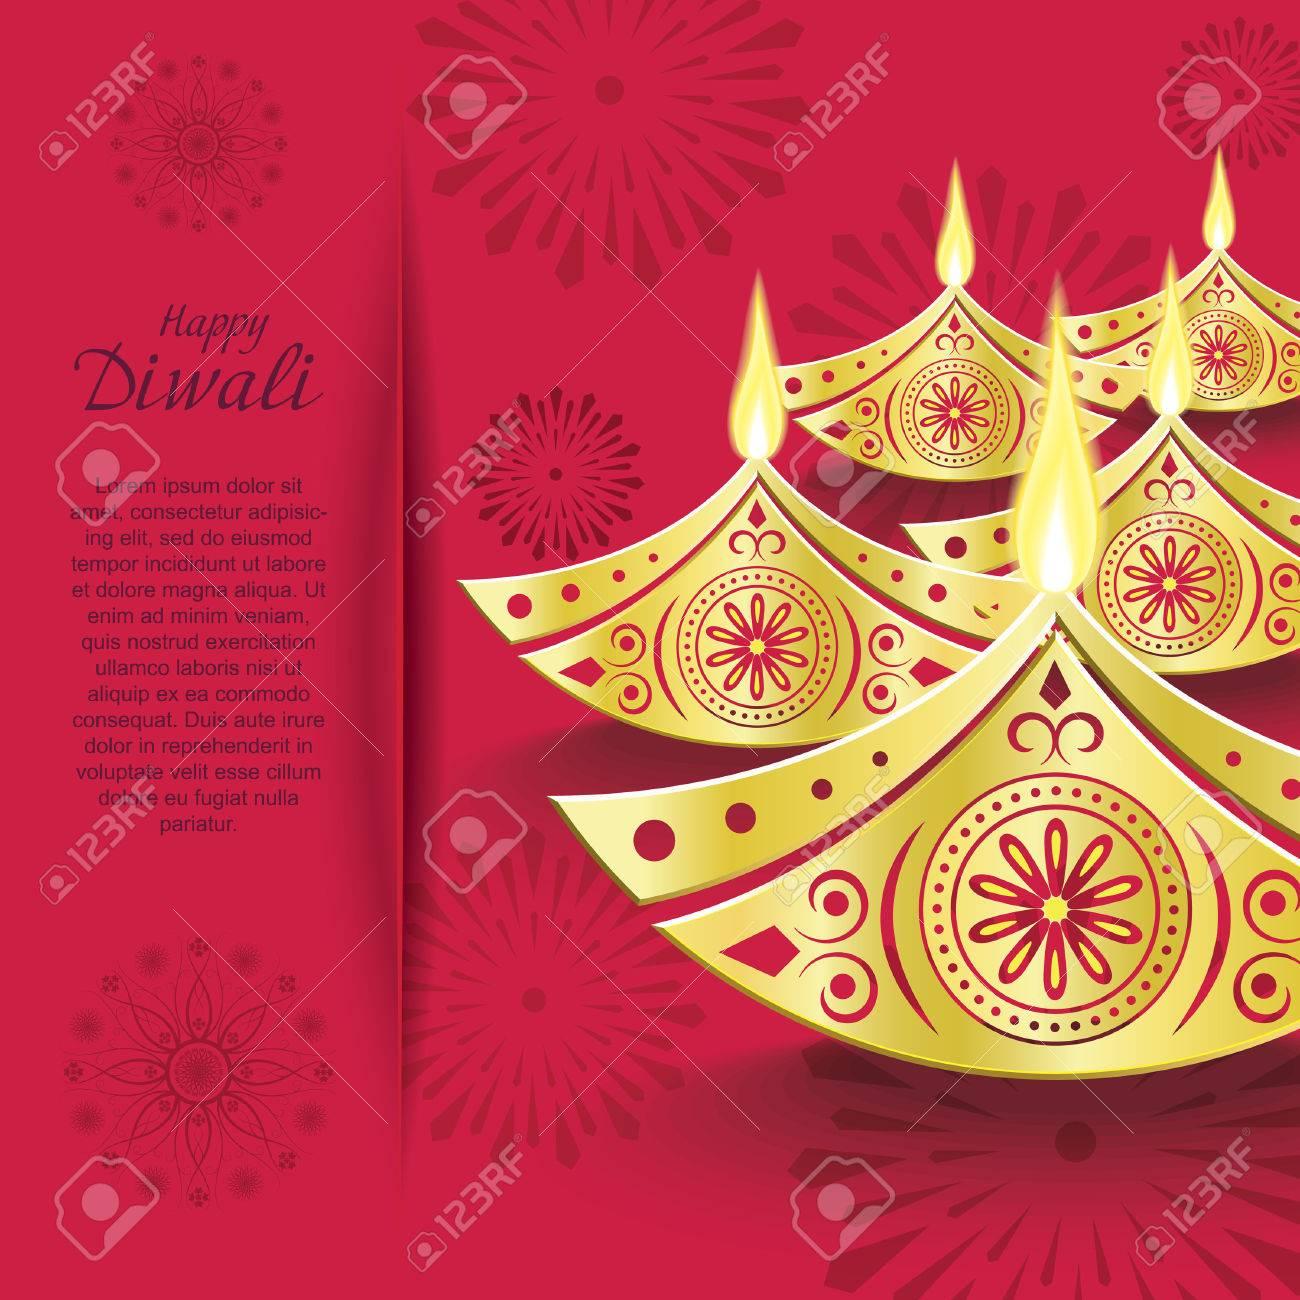 Creative vector design of burning diwali diya for greeting card creative vector design of burning diwali diya for greeting card stock vector 42045073 m4hsunfo